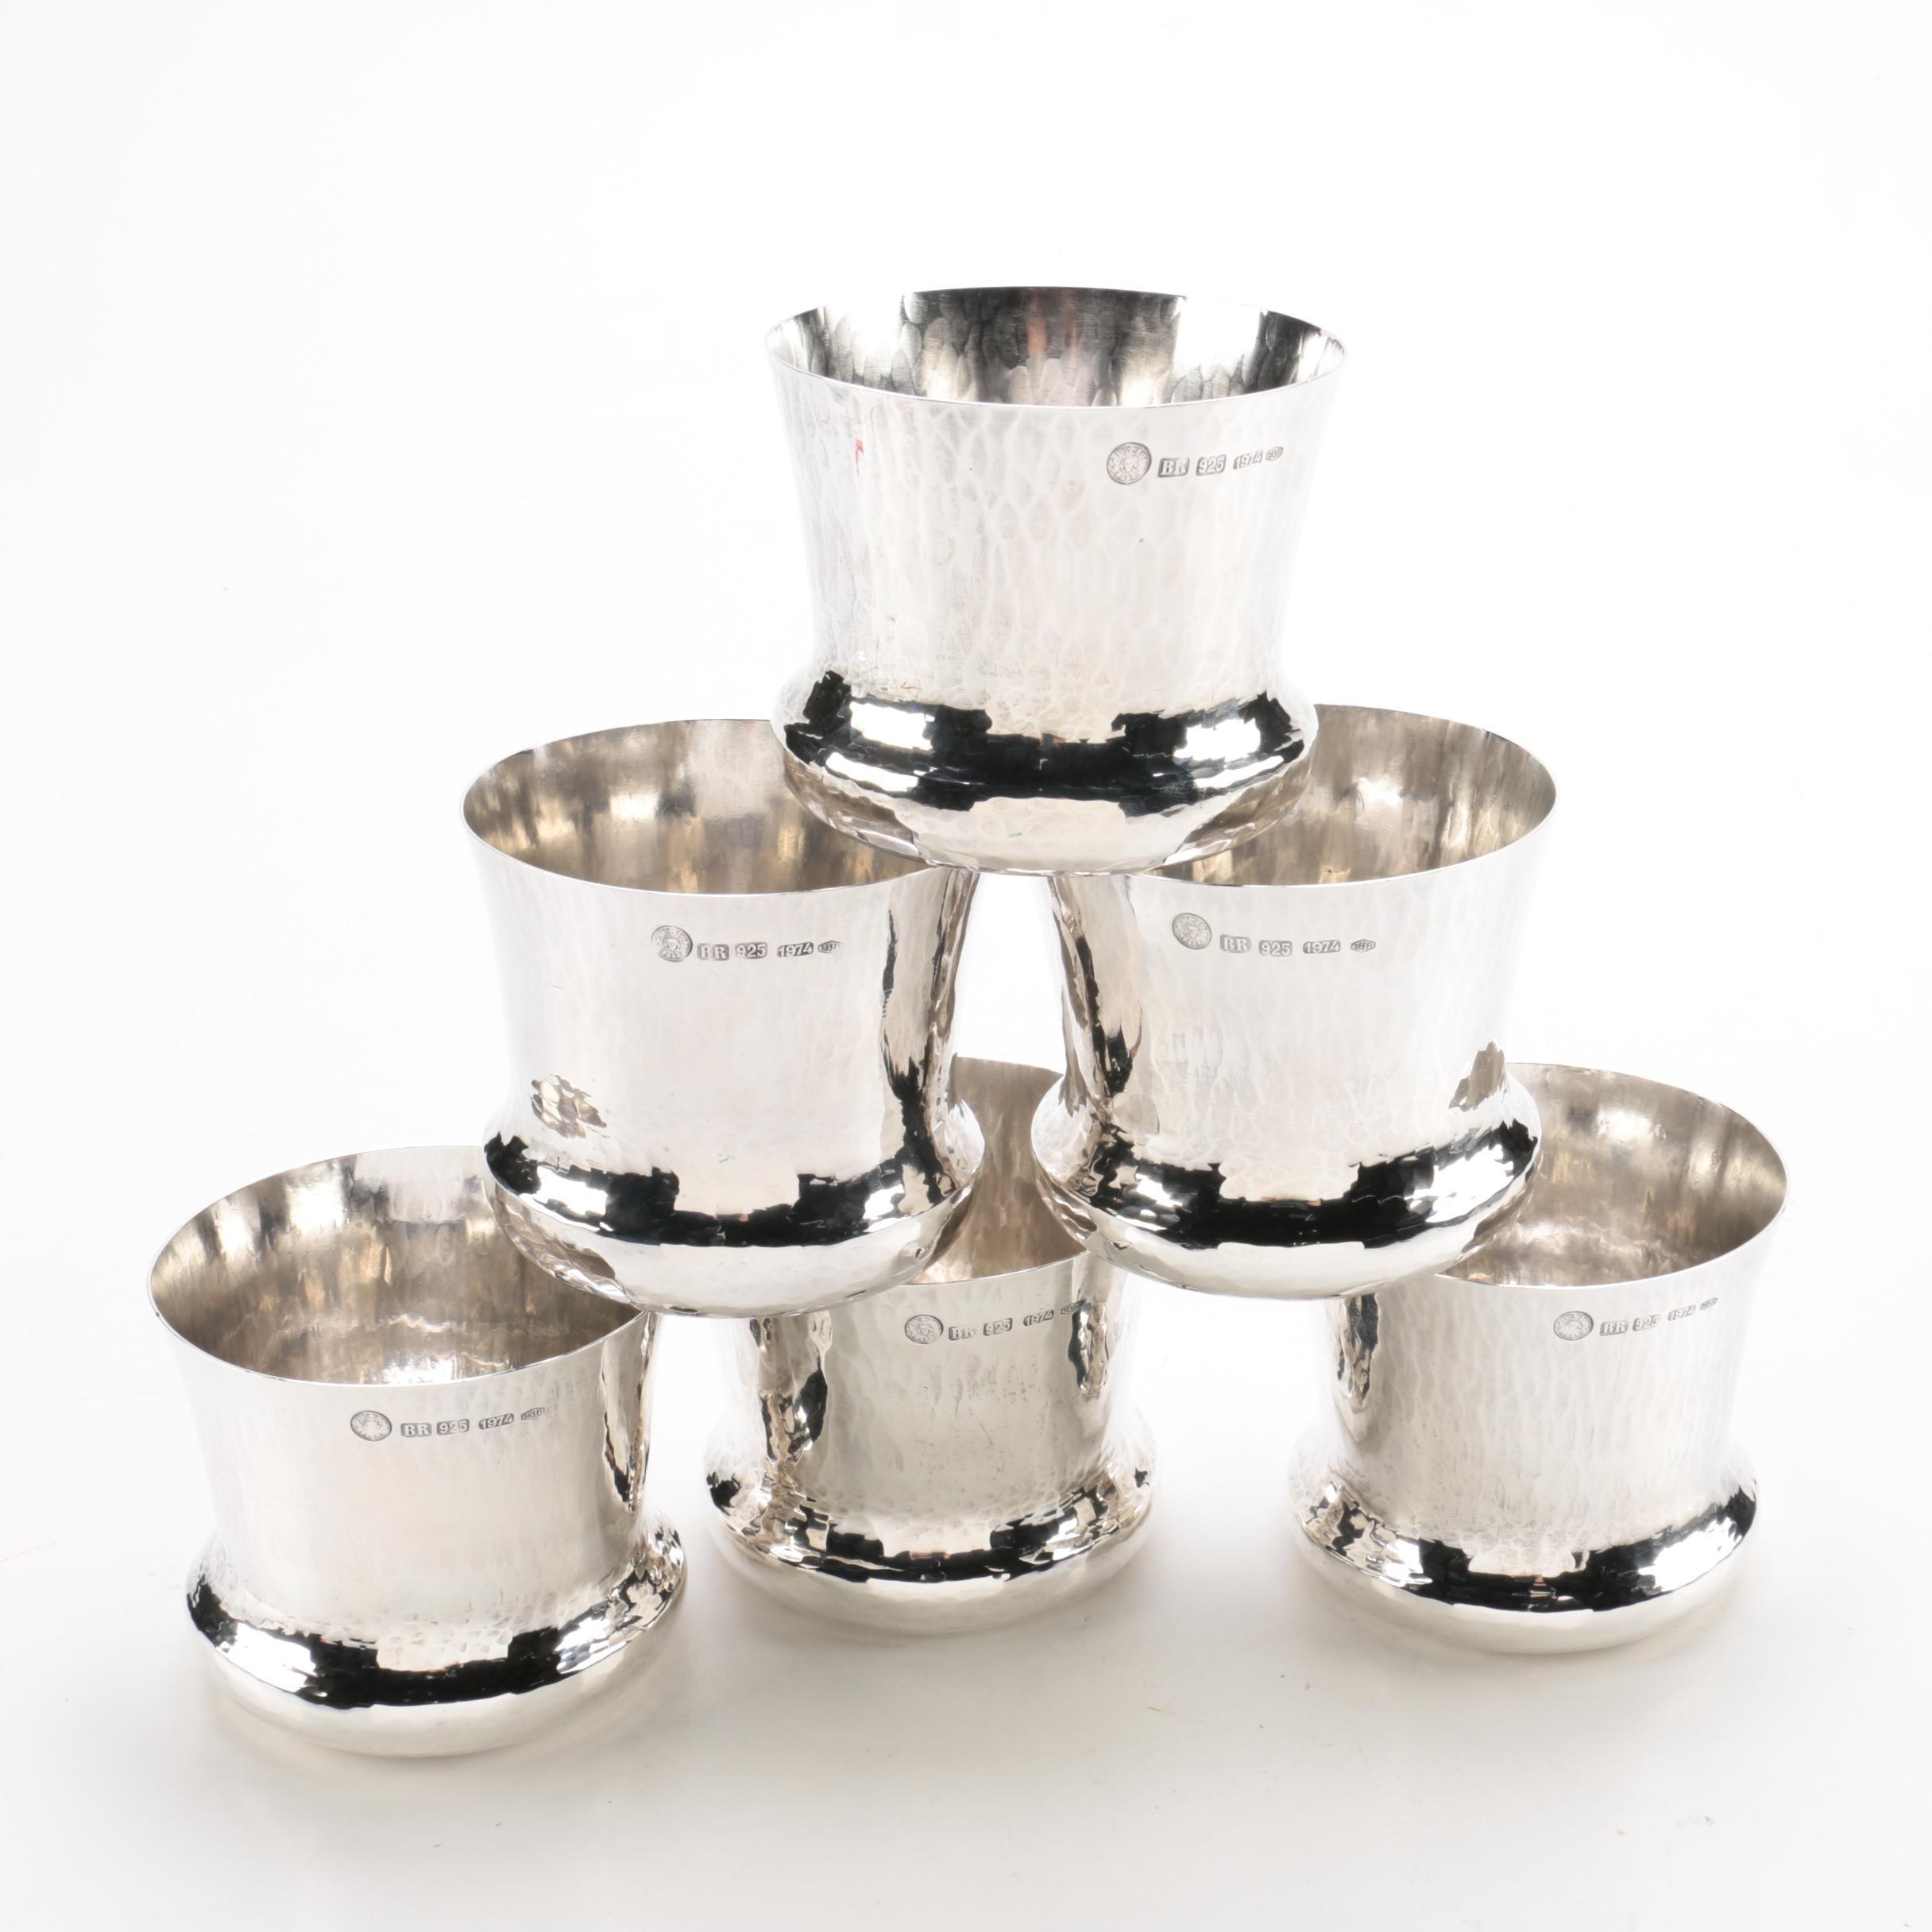 1974 Brandimarte SRL Sterling Silver Dram Cups